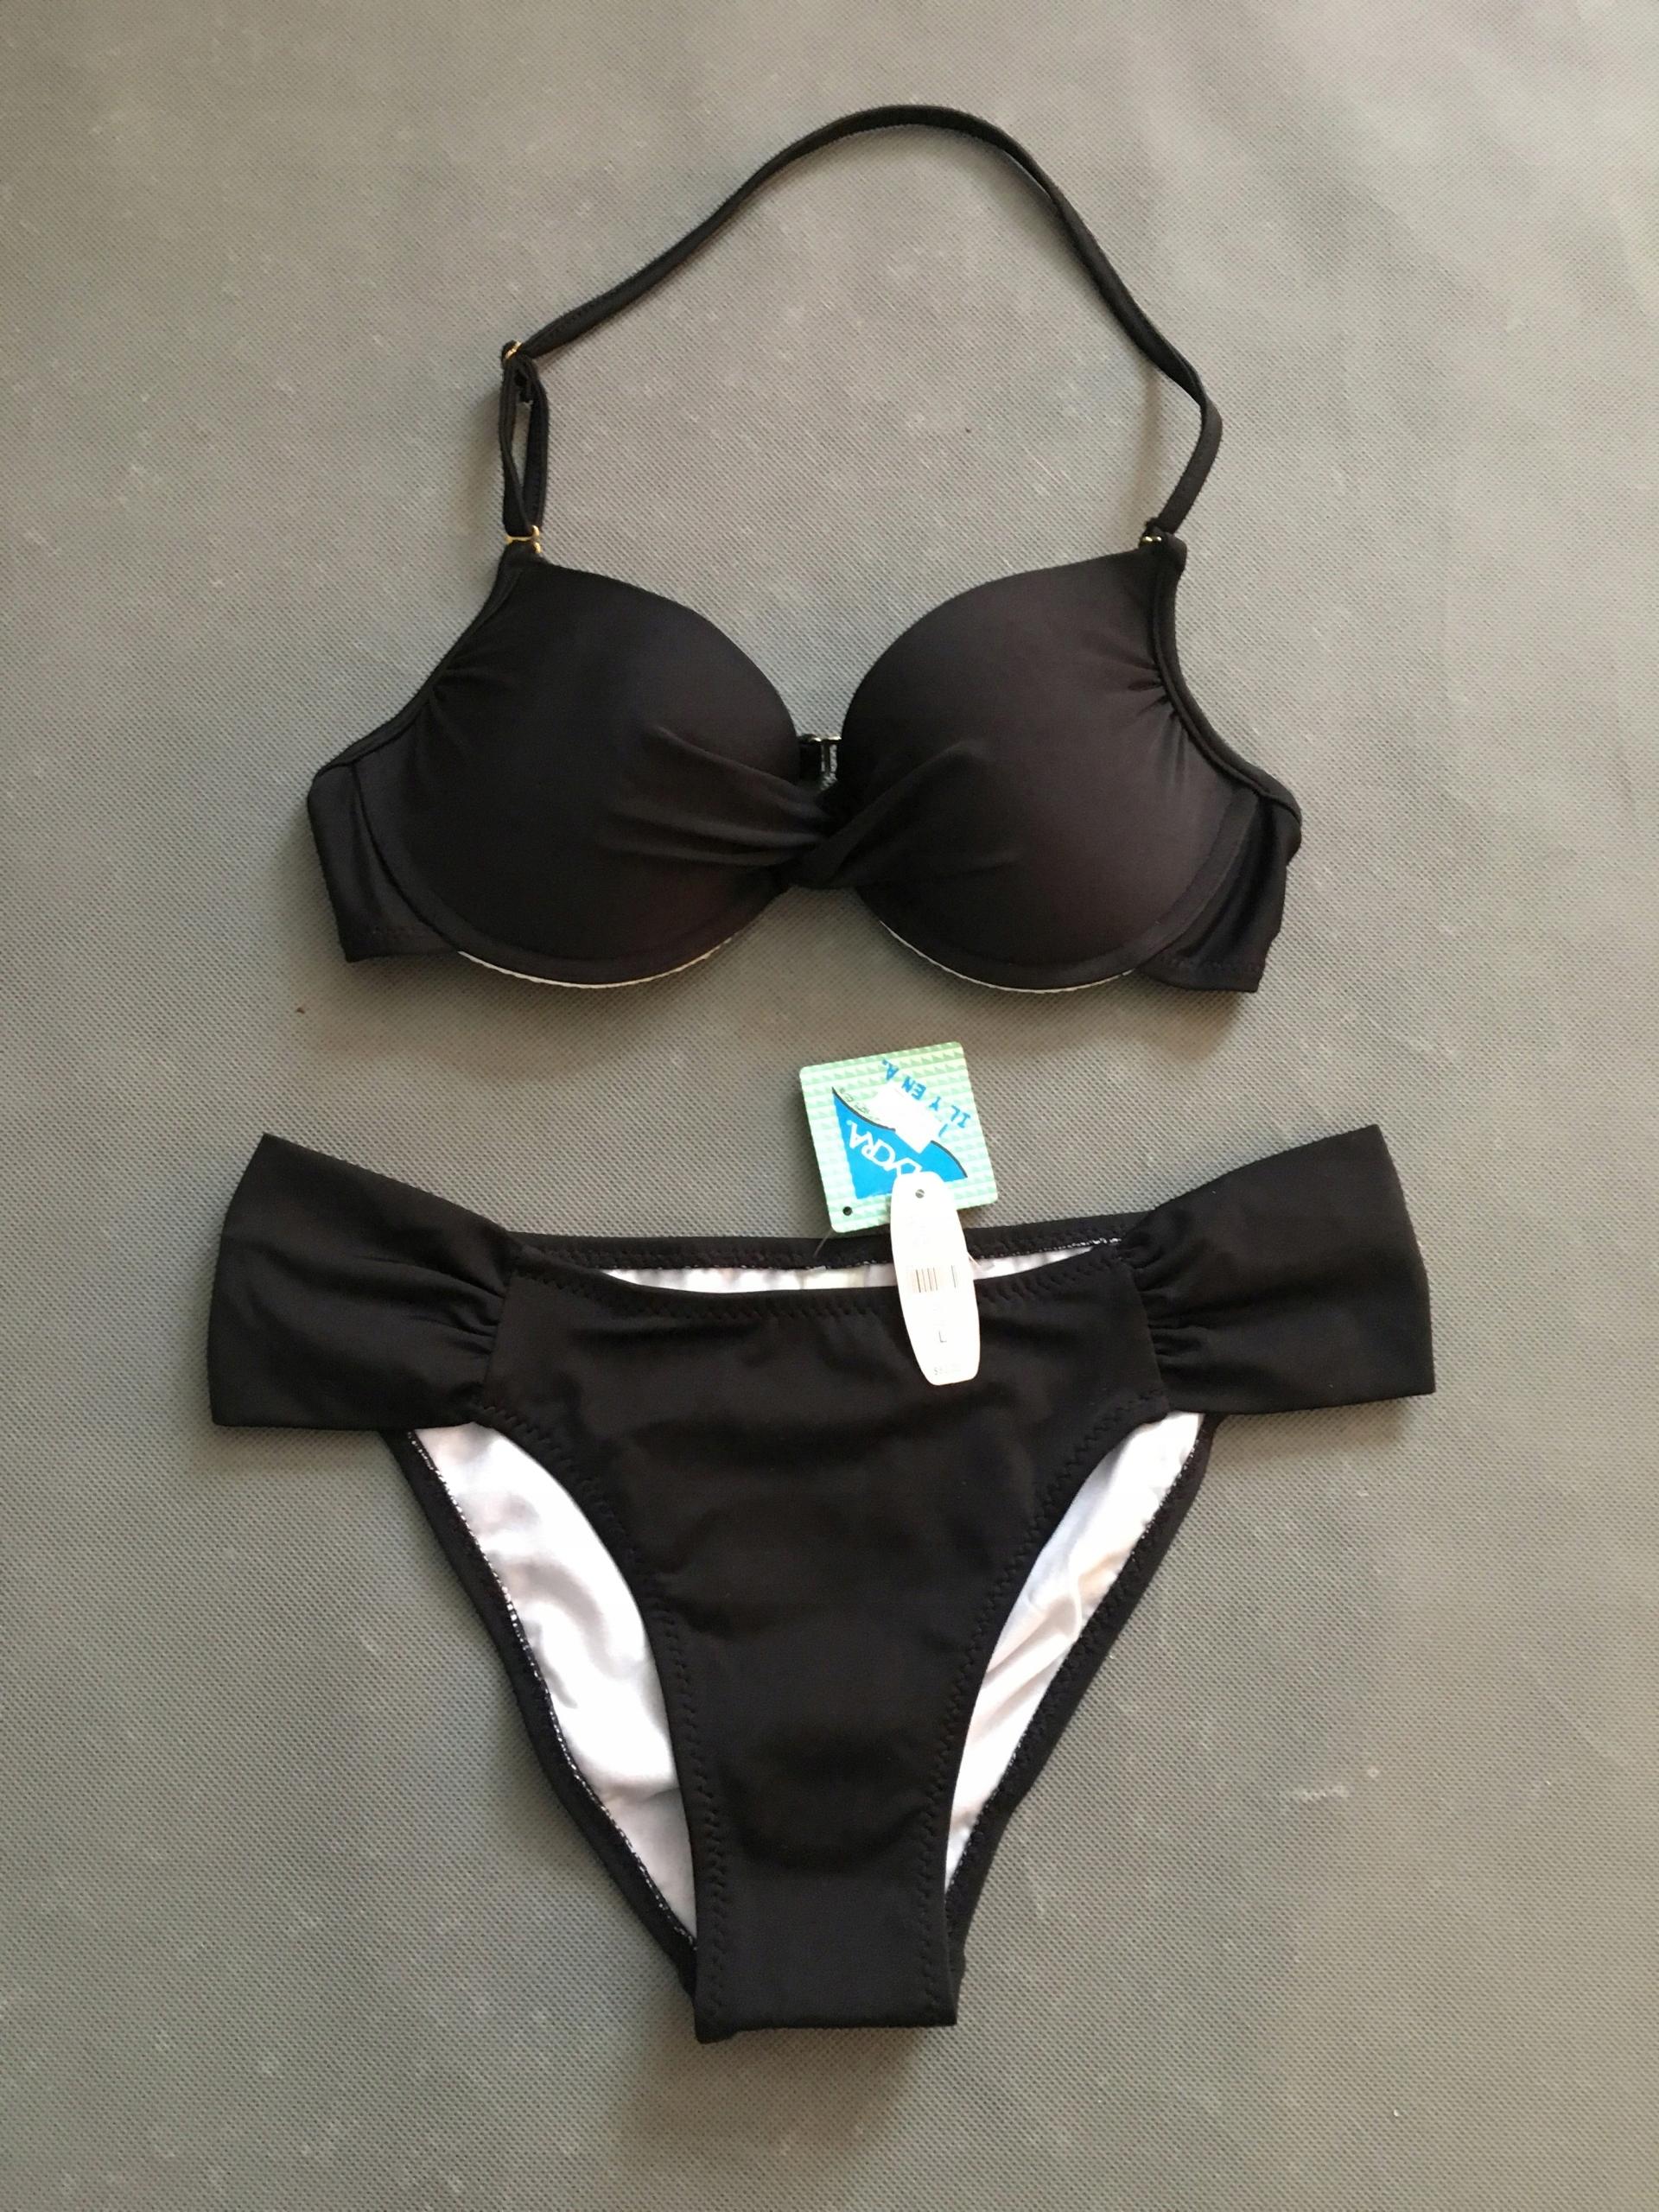 feea6f0aa5aa68 VICTORIA SECRET strój kąpielowy push up S - 7438660570 - oficjalne ...